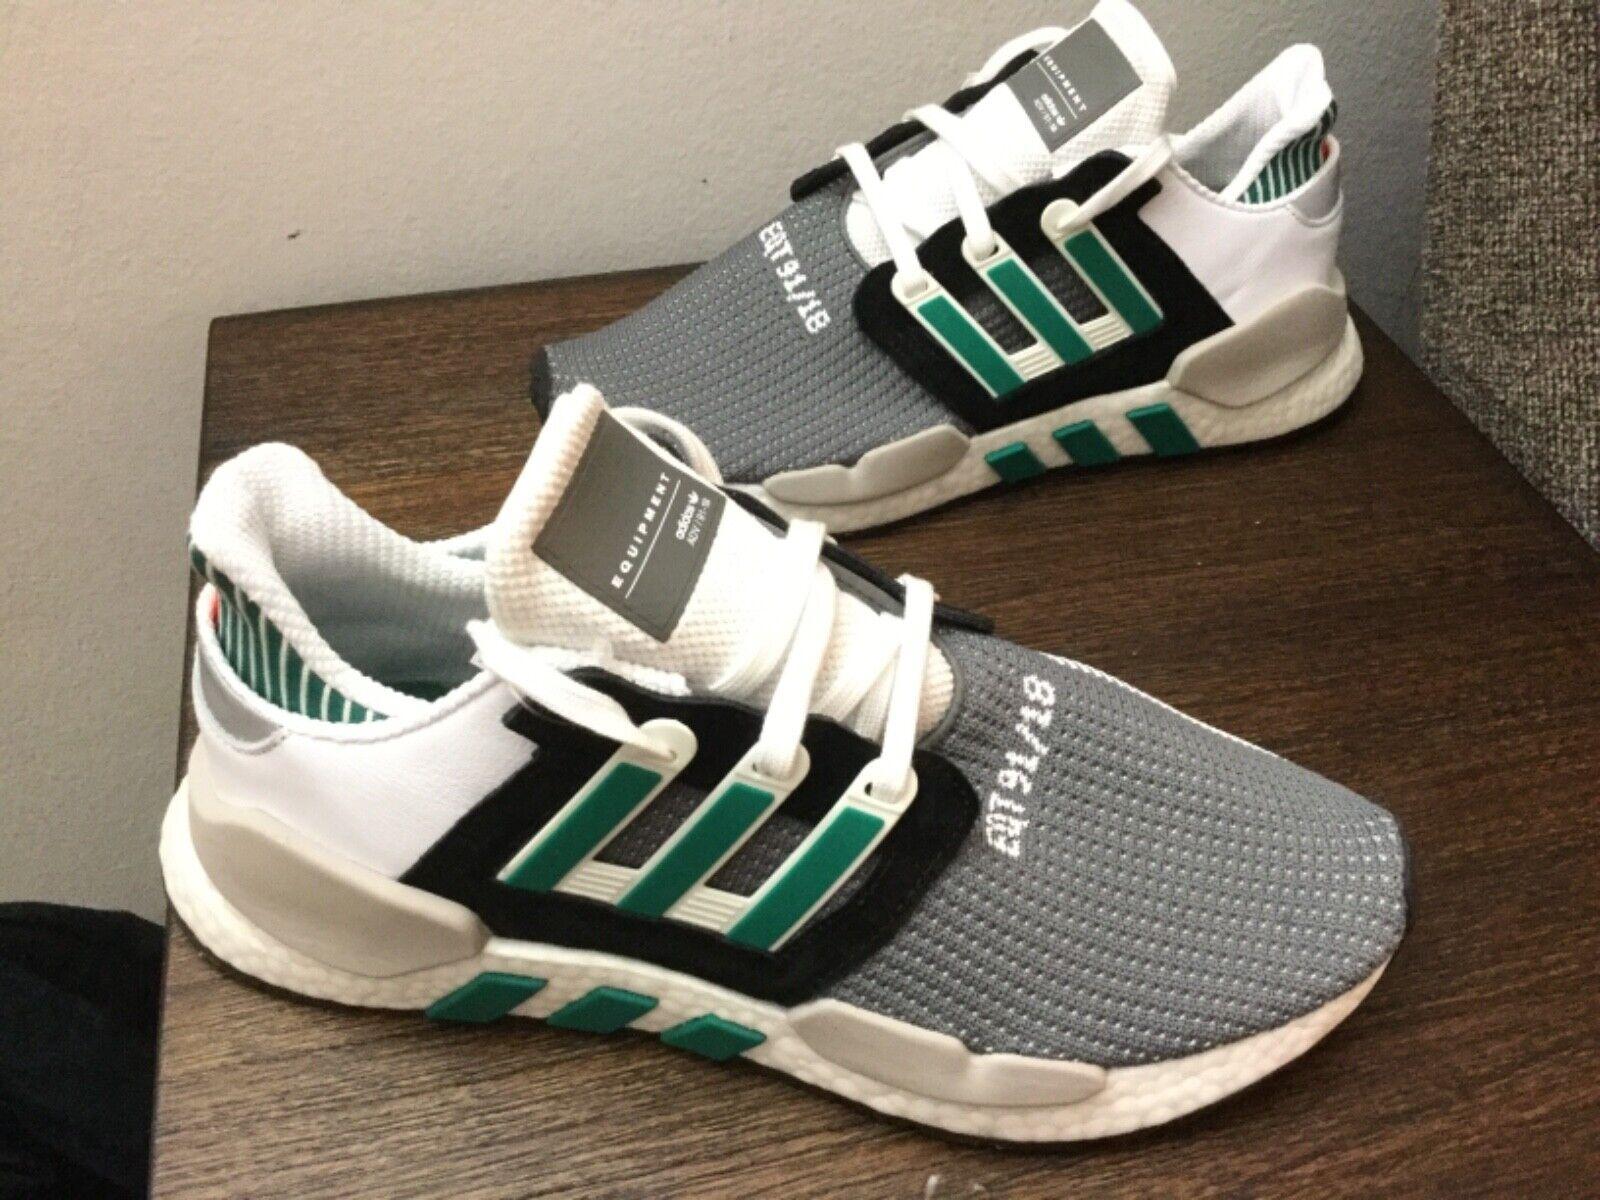 Adidas EQT Equipment Support 91  18  Boost bianca verde AQ1037 men 655533;s 10.5 &U11.5  all'ingrosso economico e di alta qualità